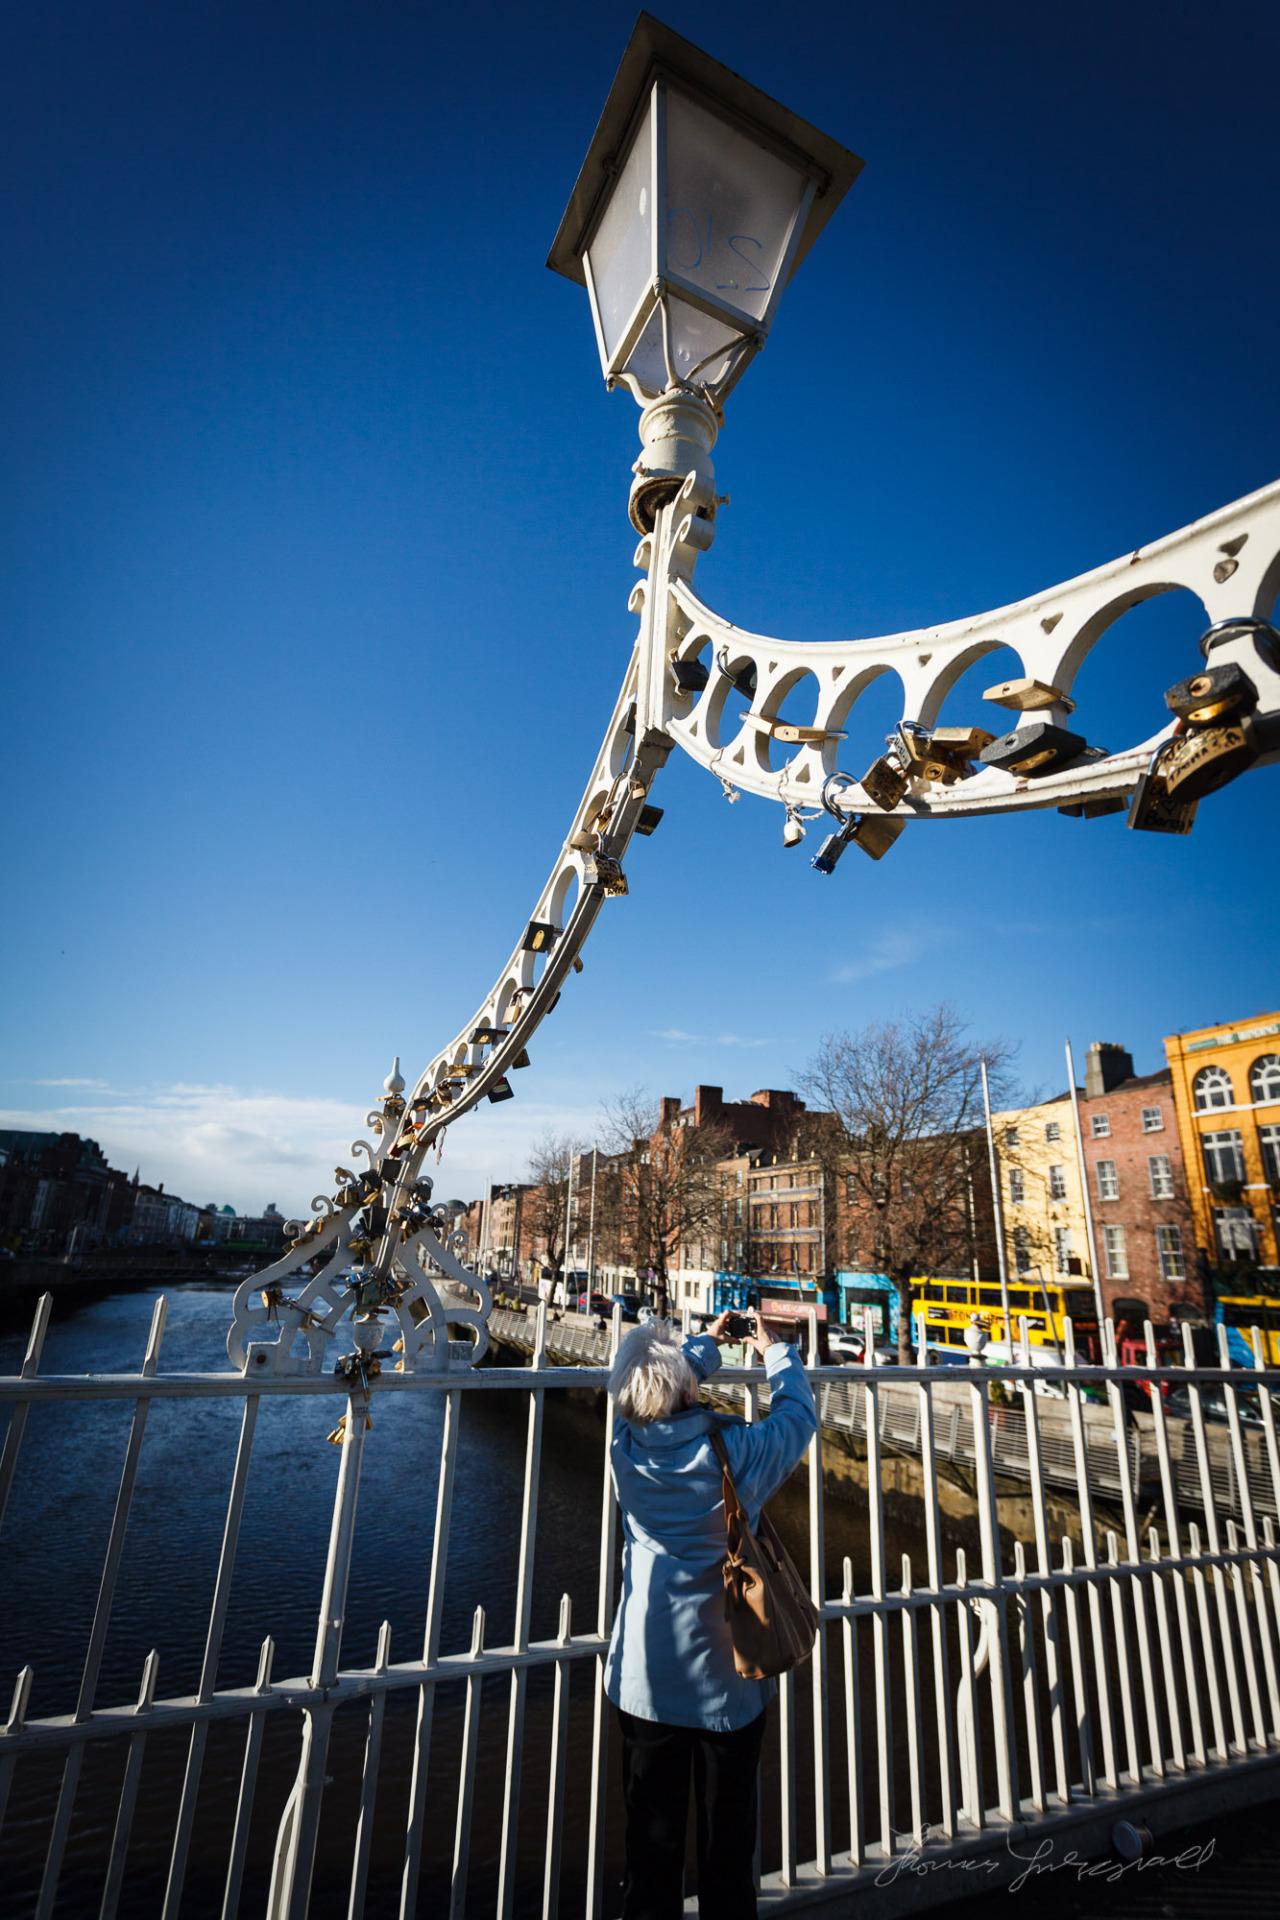 Tourist taking a photograph on the ha'penny bridge in Dublin